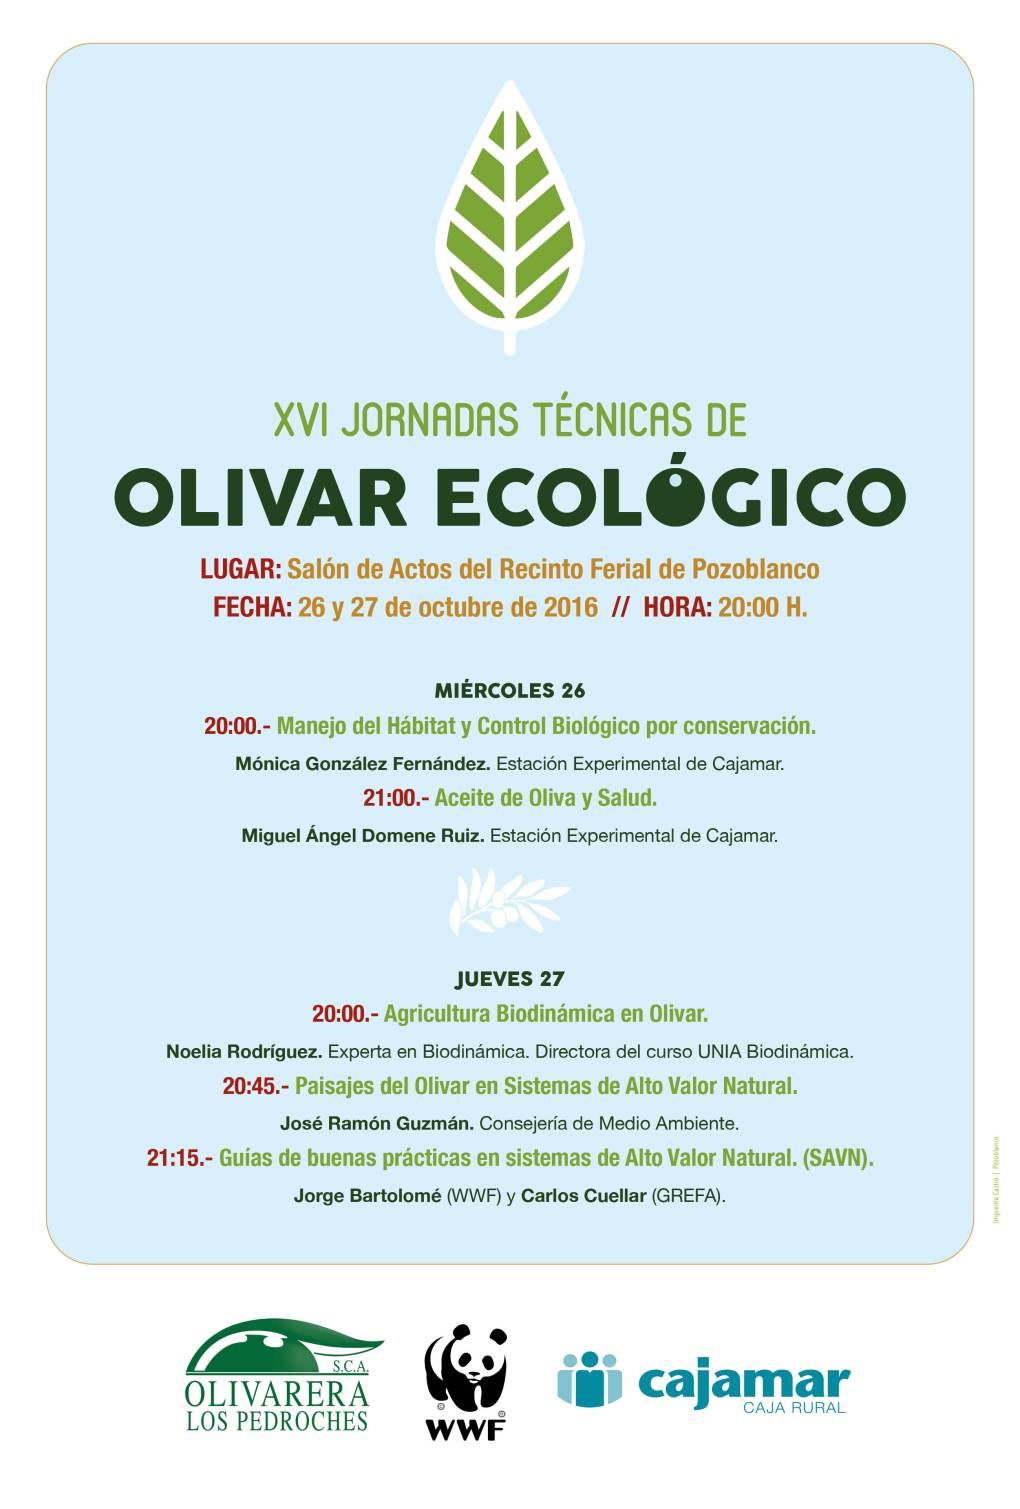 cartel-xvi-jornadas-tecnicas-olivar-de-sierra-los-pedroches-aceite-ecologico-olivarera-olipe-olivalle